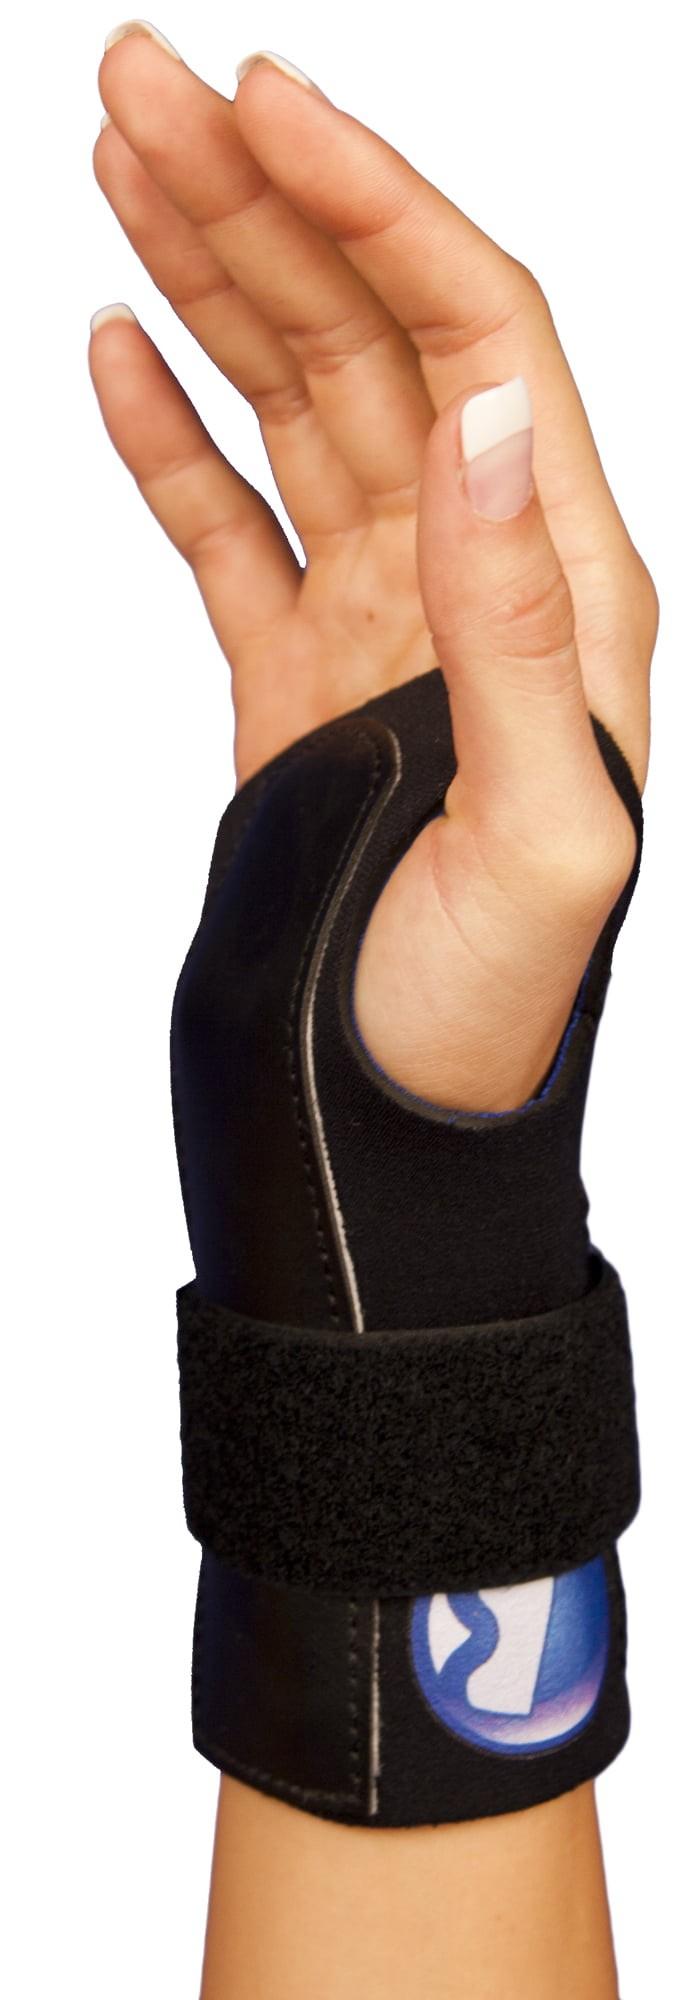 "Bunga Braces - 6"" Pro Wrist Support 2"